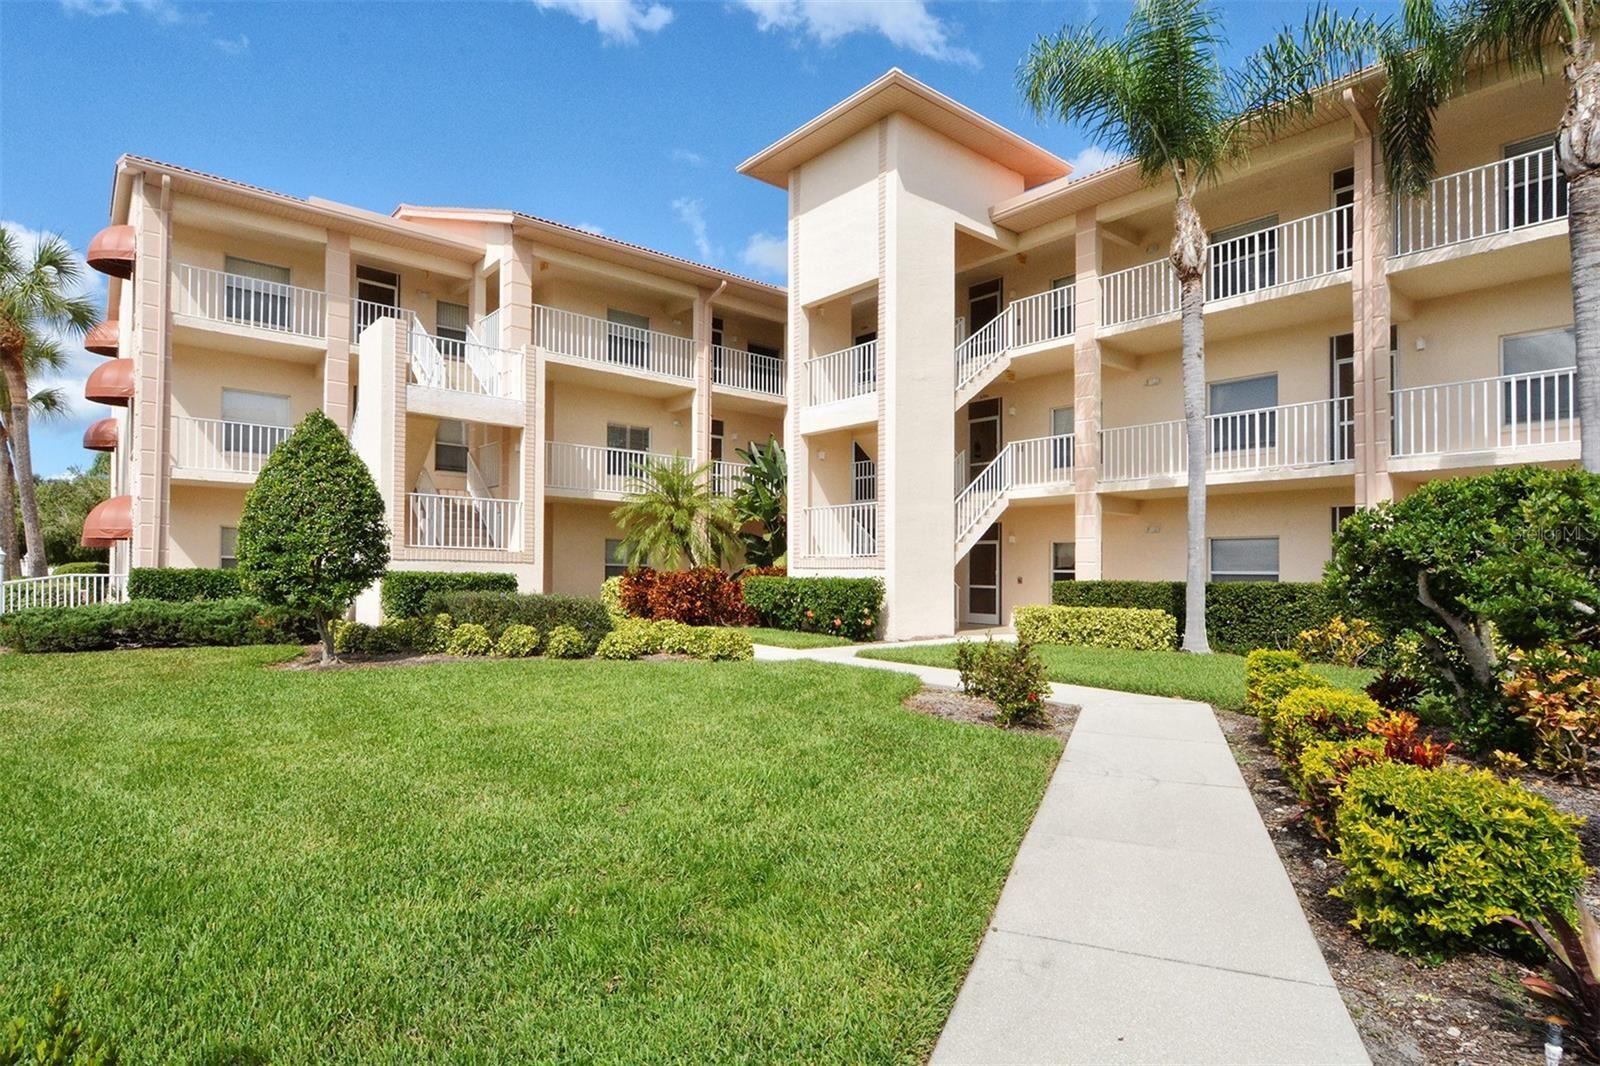 9610 CLUB SOUTH CIRCLE #4301, Sarasota, FL 34238 - #: A4503528